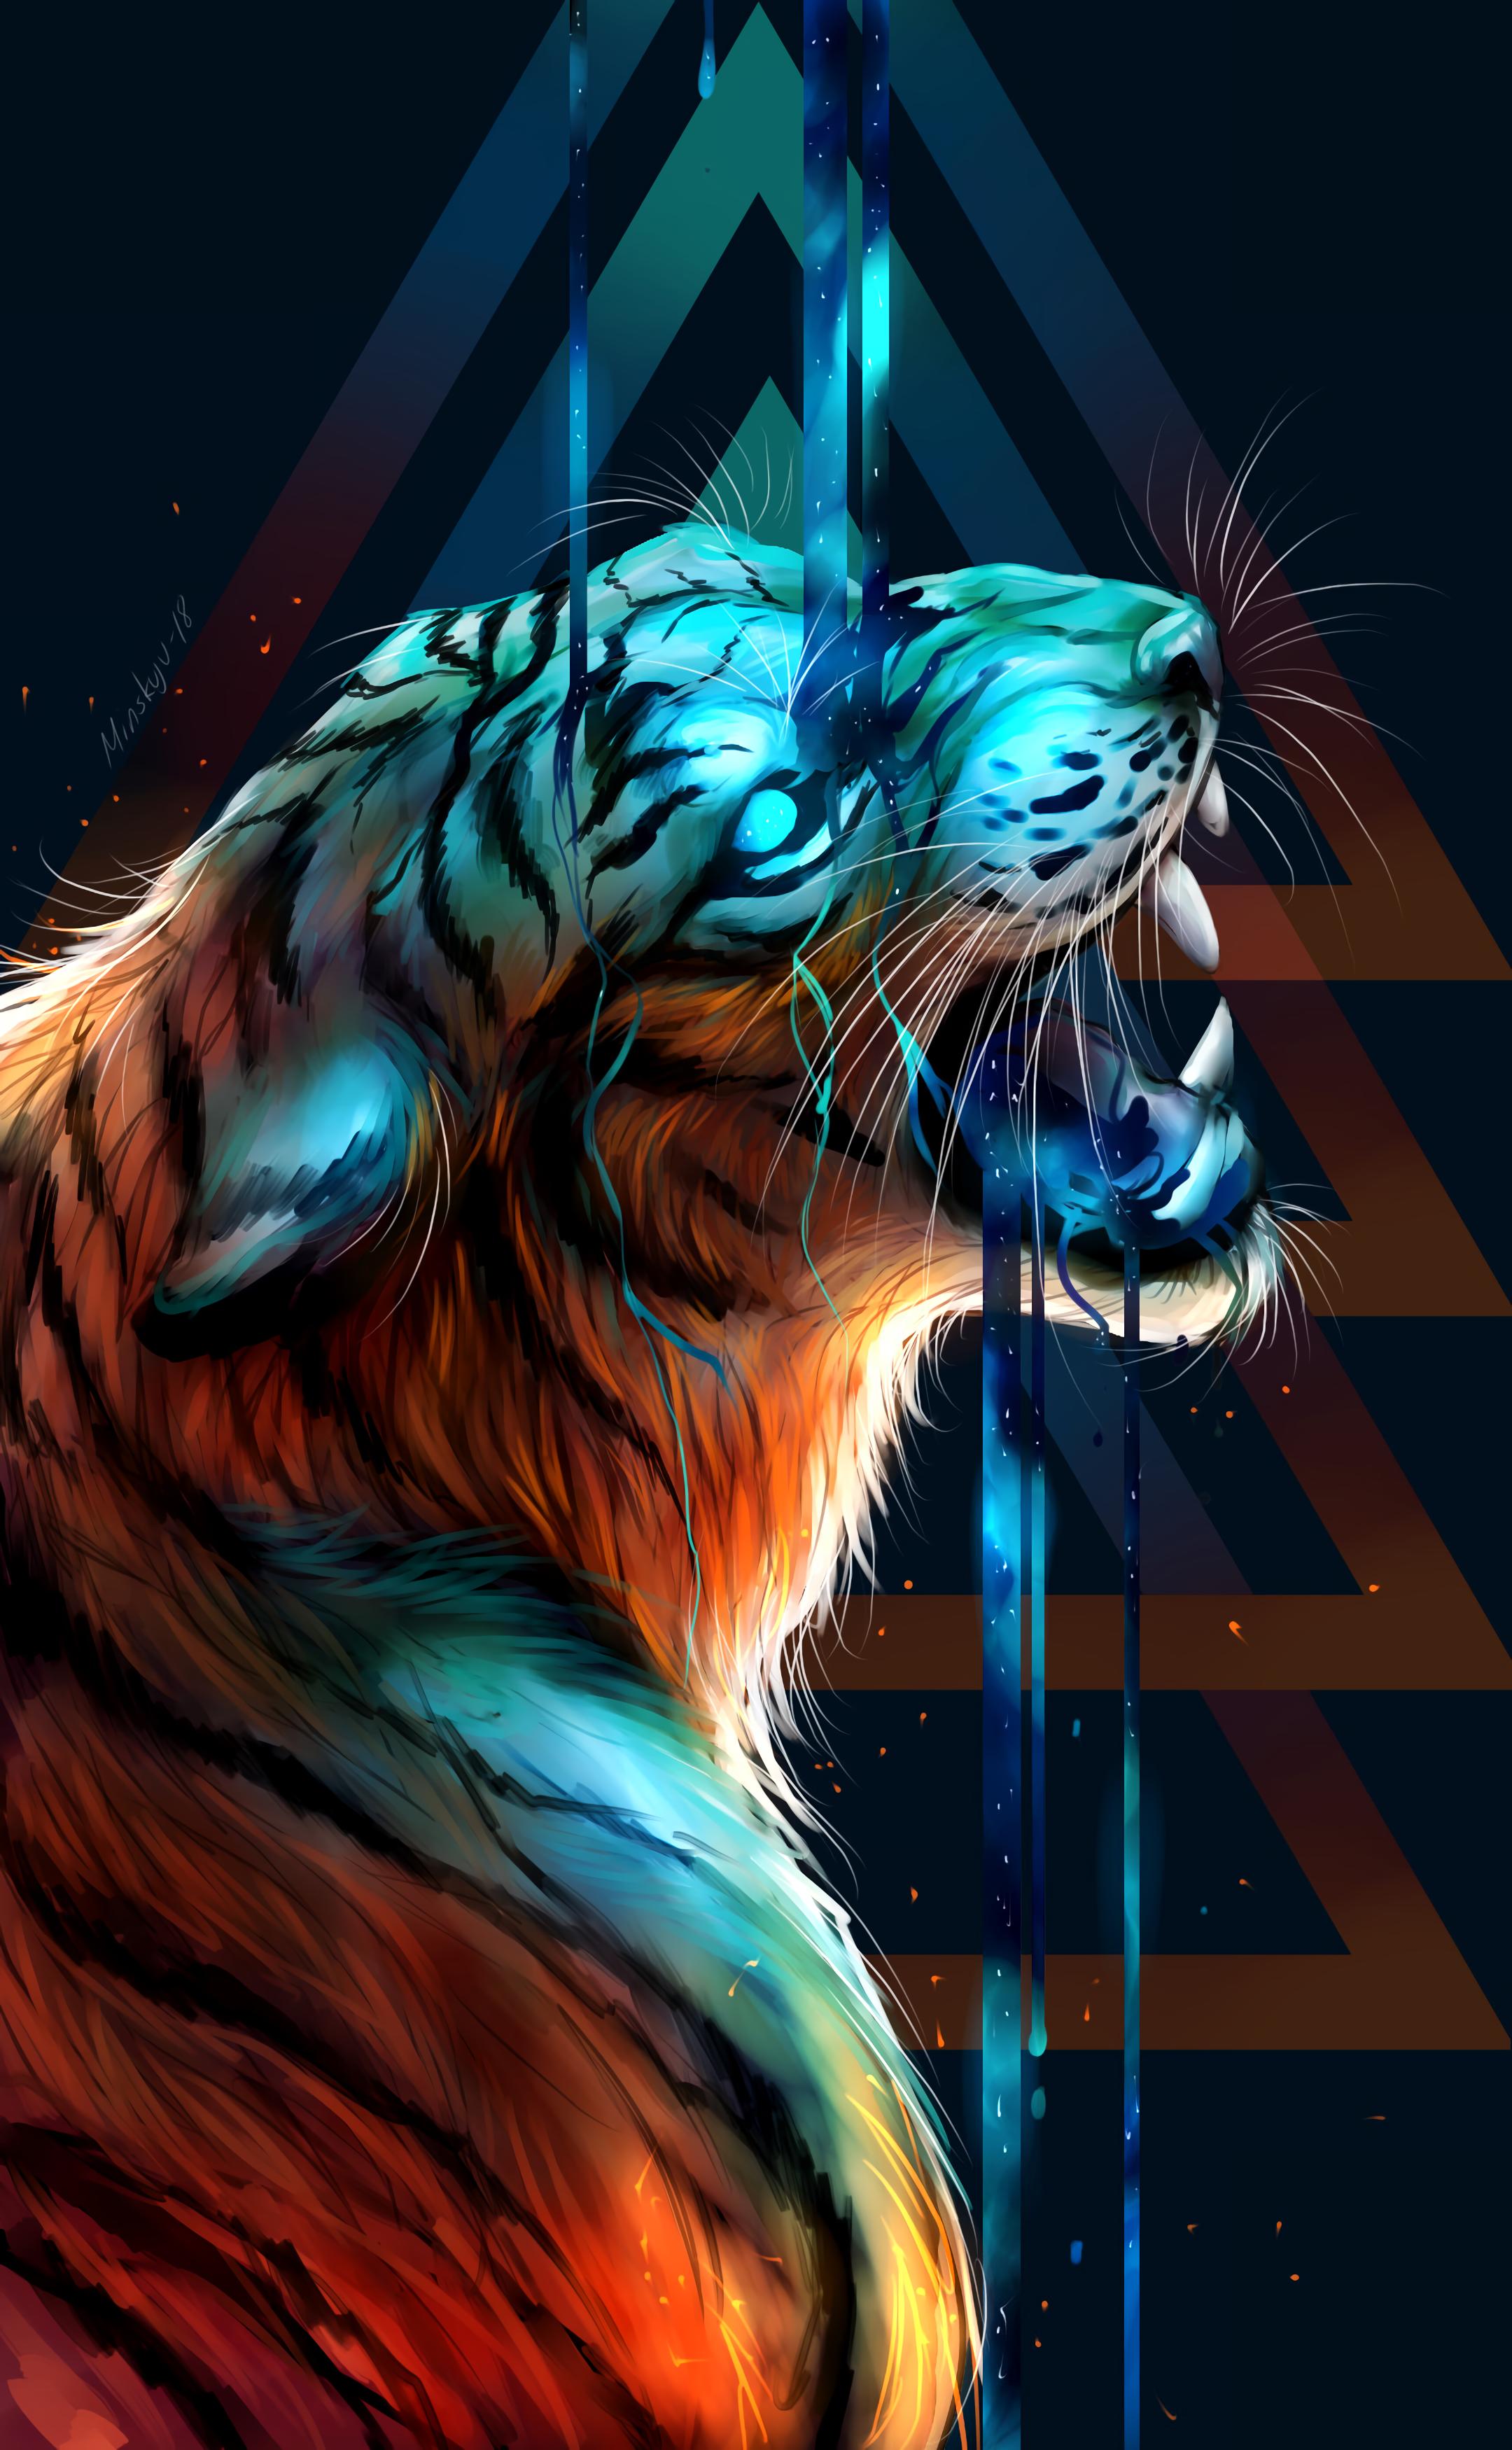 Tiger Wallpaper Pinturas De Animais Arte Sobre Animais Selvagens Papel De Parede De Animais